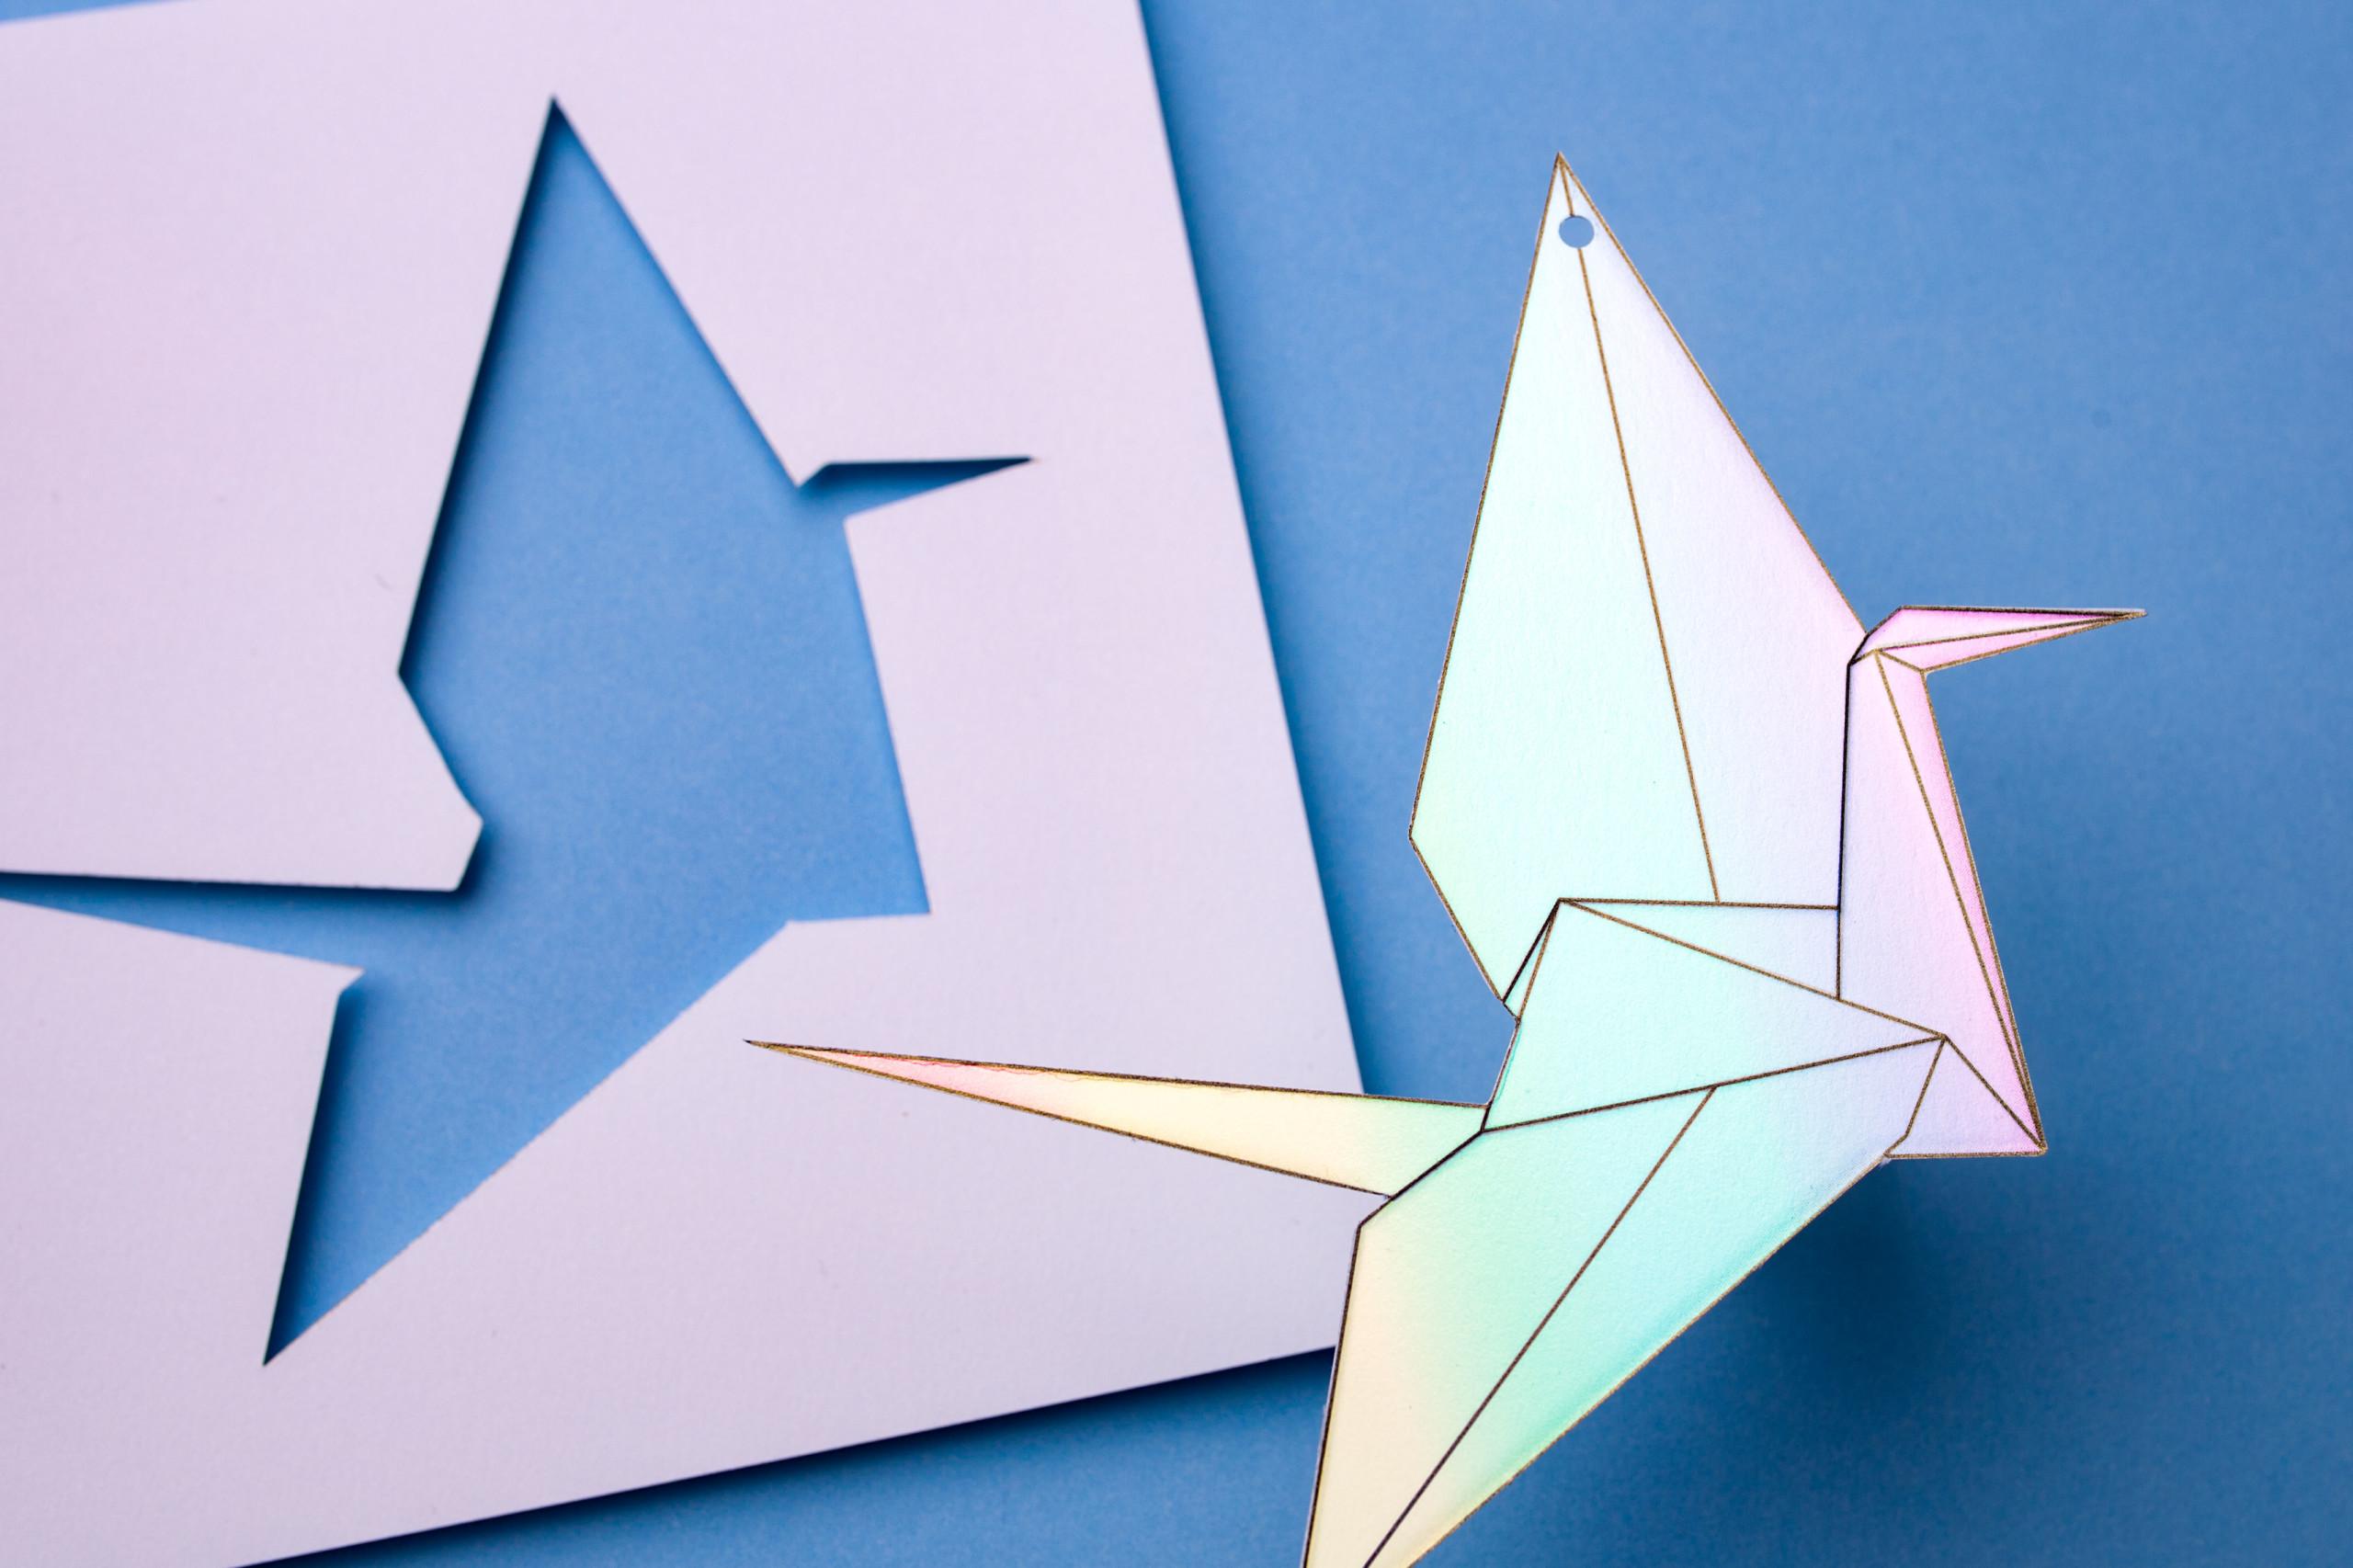 Gestanzter Origami Figur, Hologram Folie, Druck-Veredelung